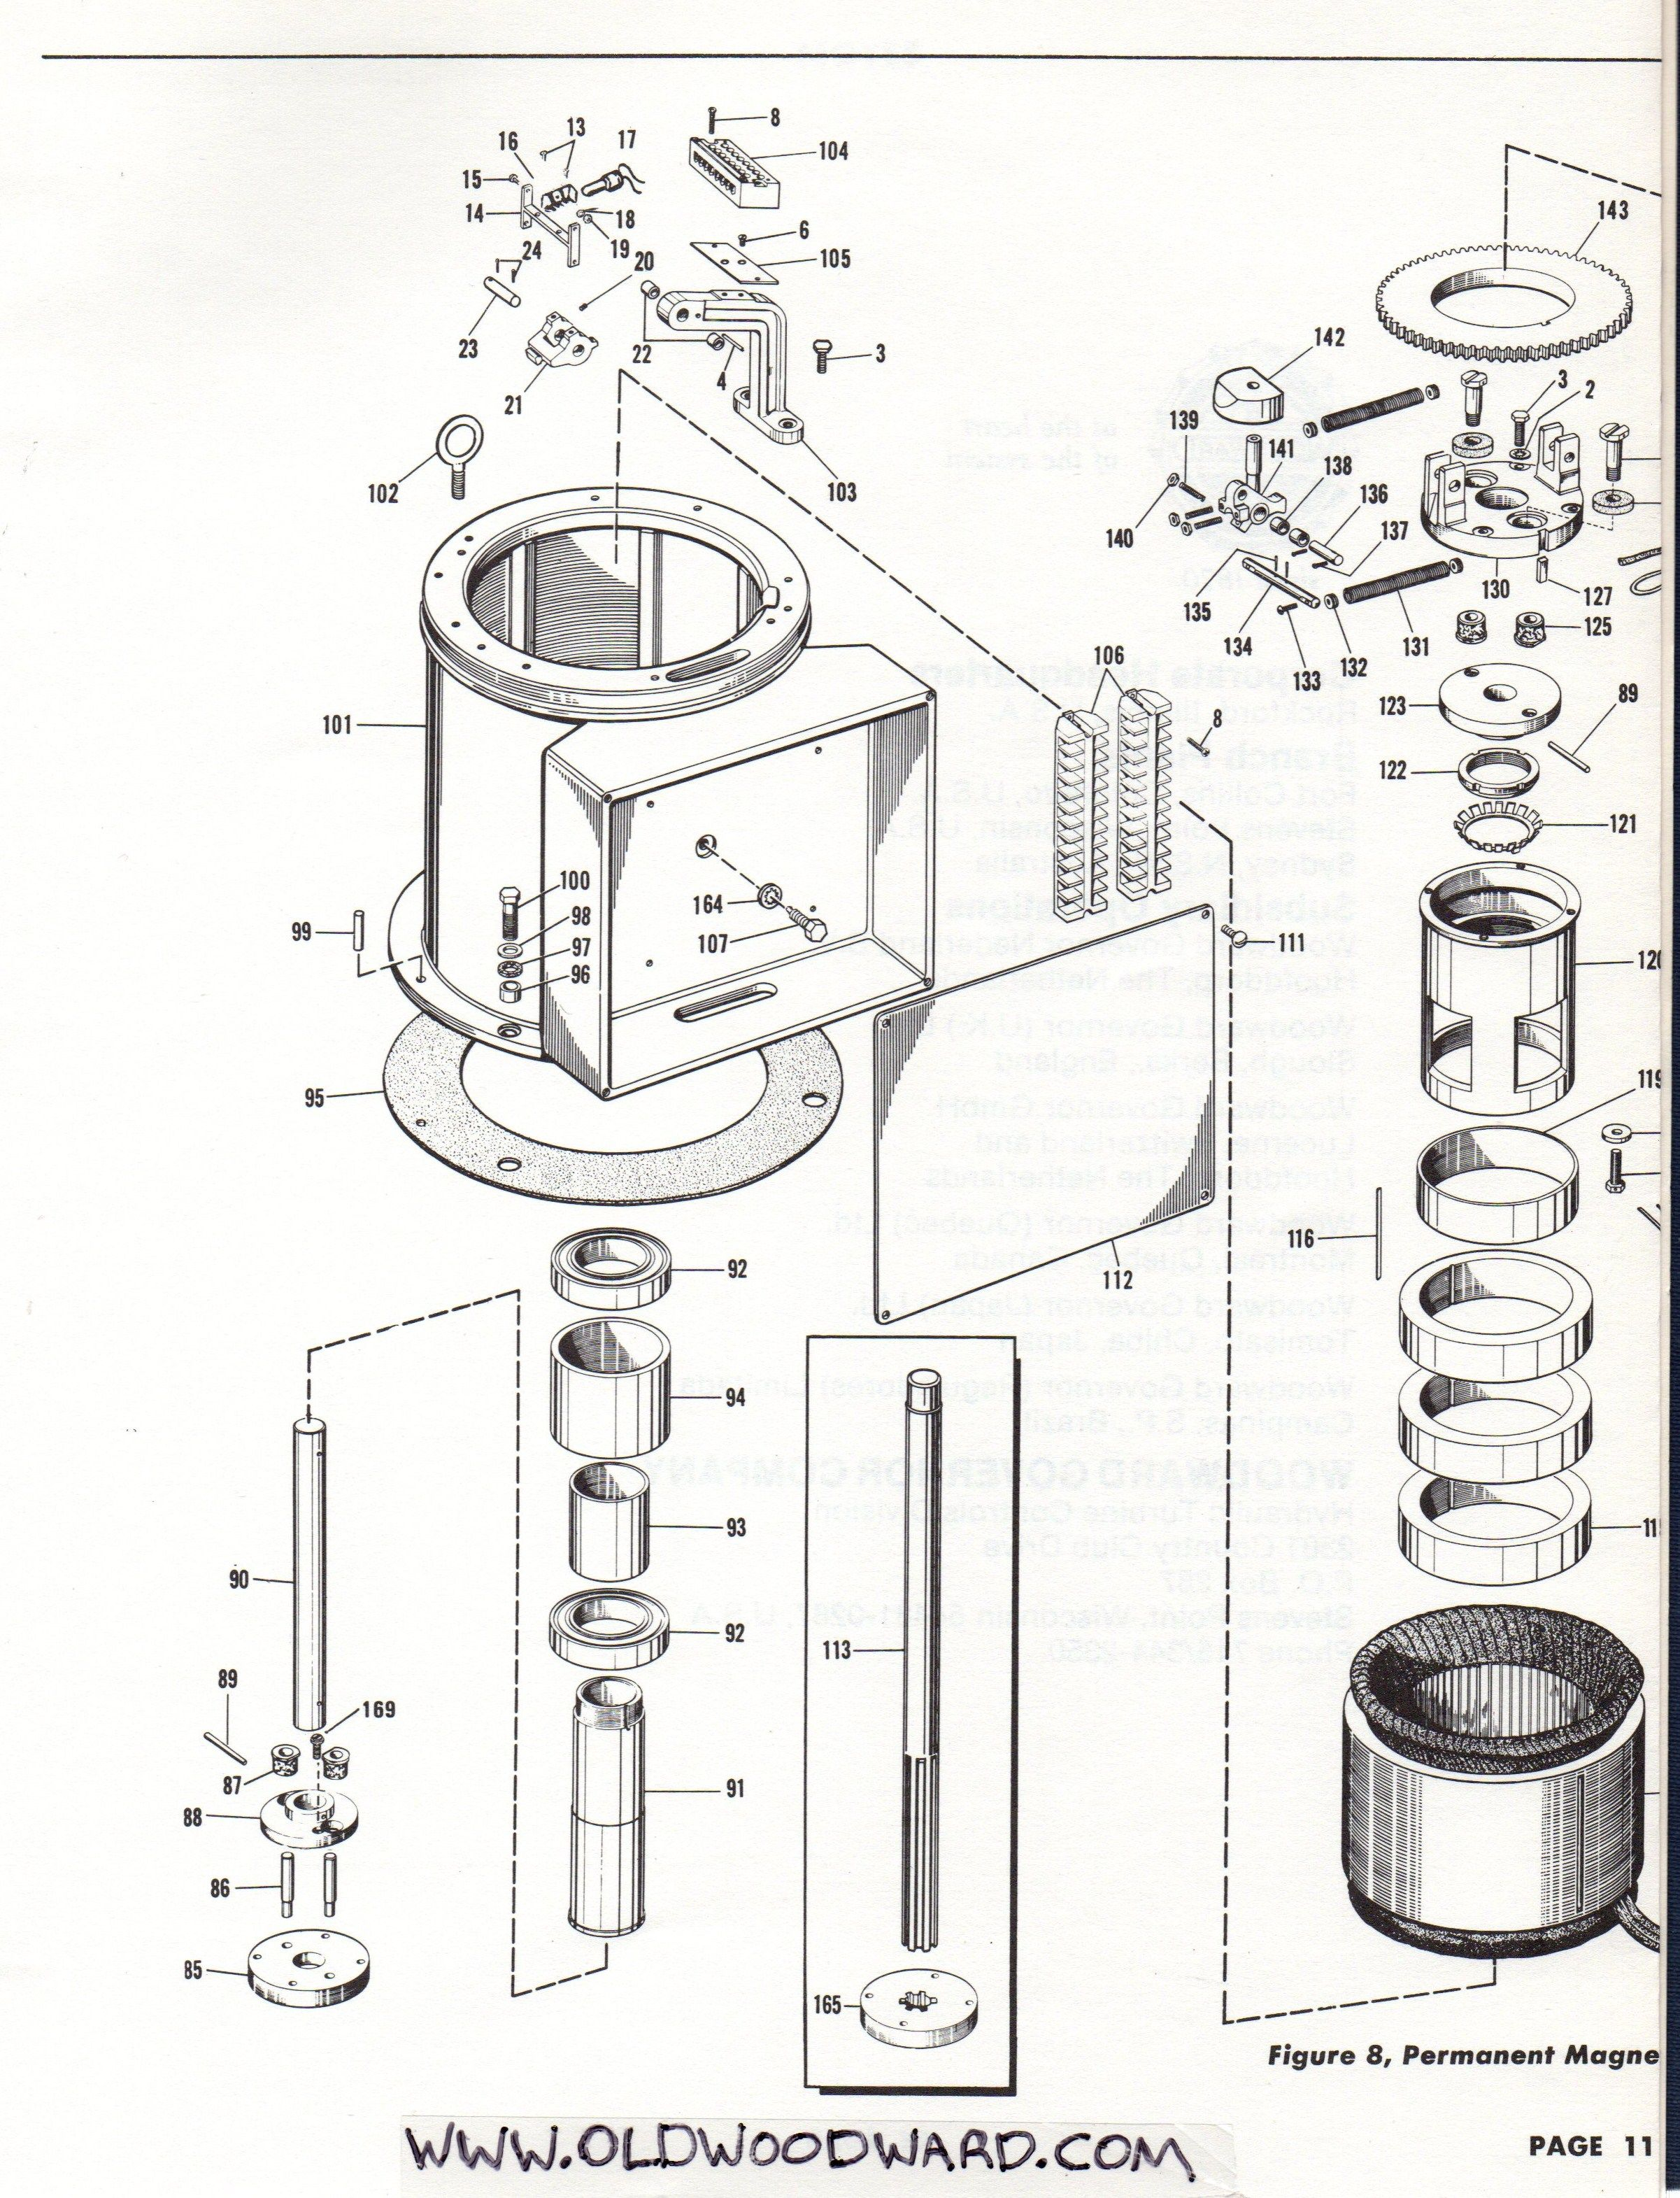 wgc manual 11002k permanent magnet generator for woodward rh pinterest com permanent magnet synchronous generator specifications Permanent Magnet AC Generator